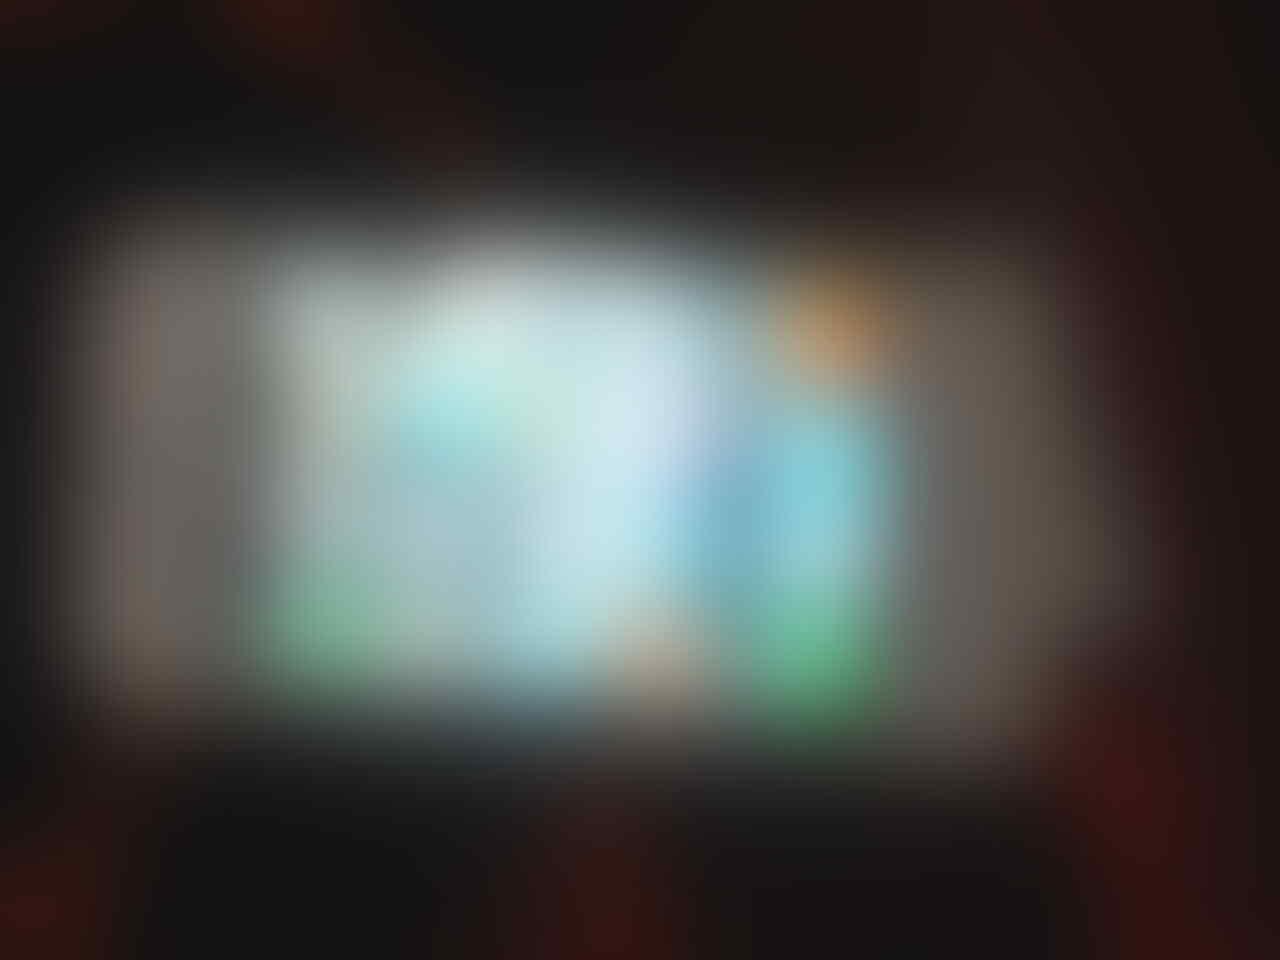 iPhone 4 white 16gb ex telkomsel 2jt aja